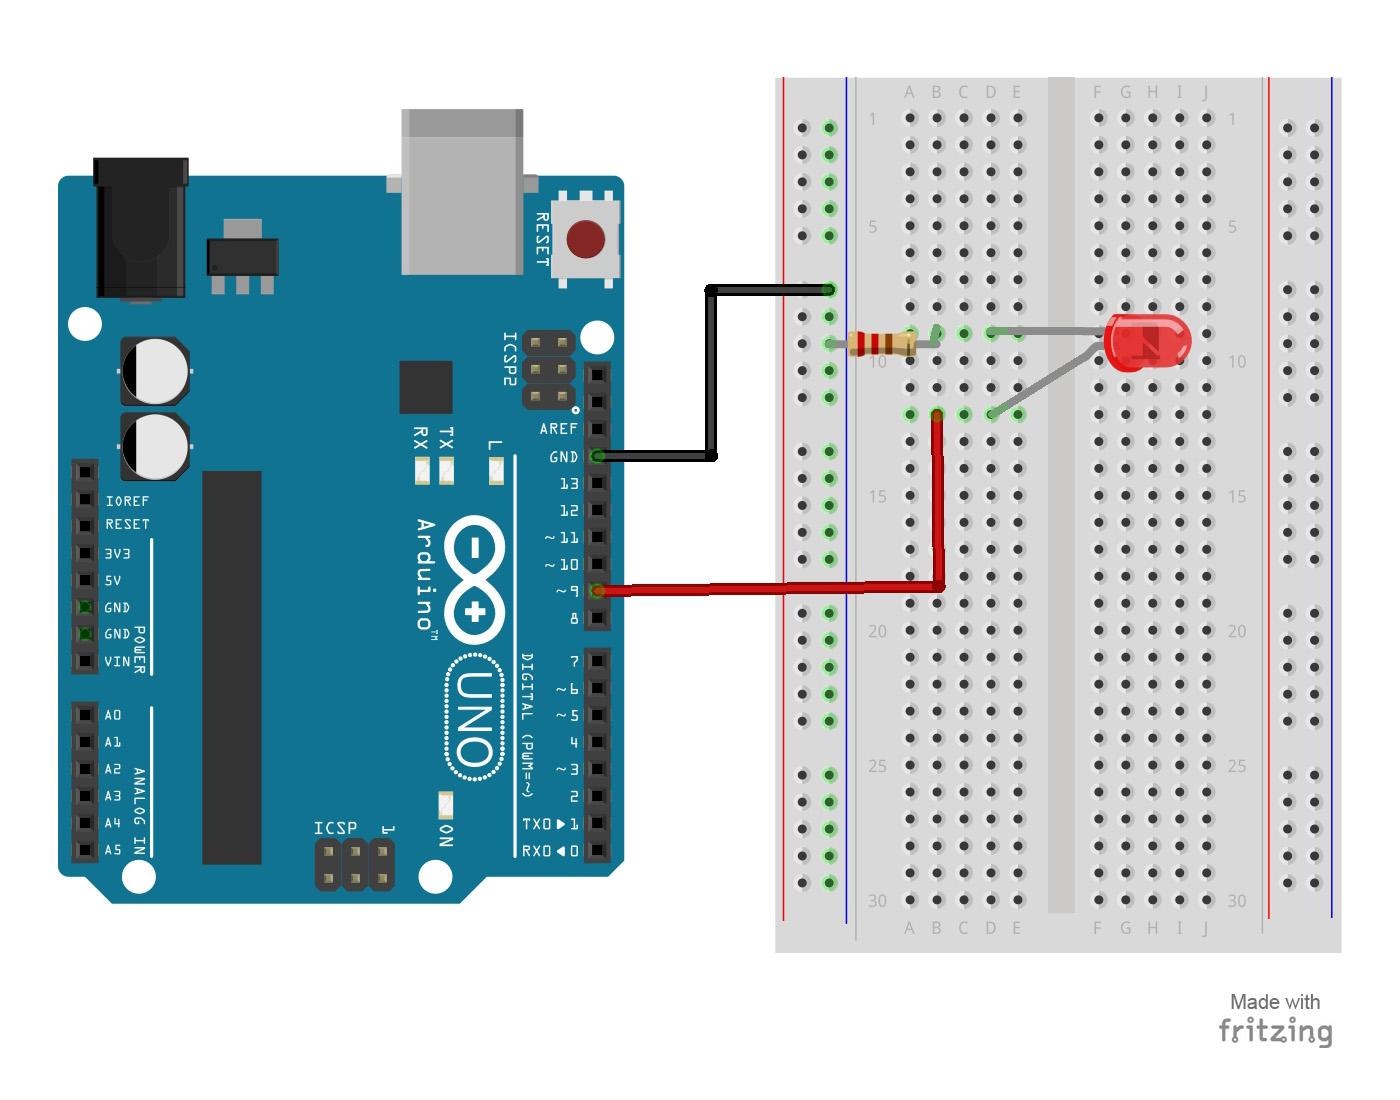 Arduino uno breadboard projects for beginners w code pdf